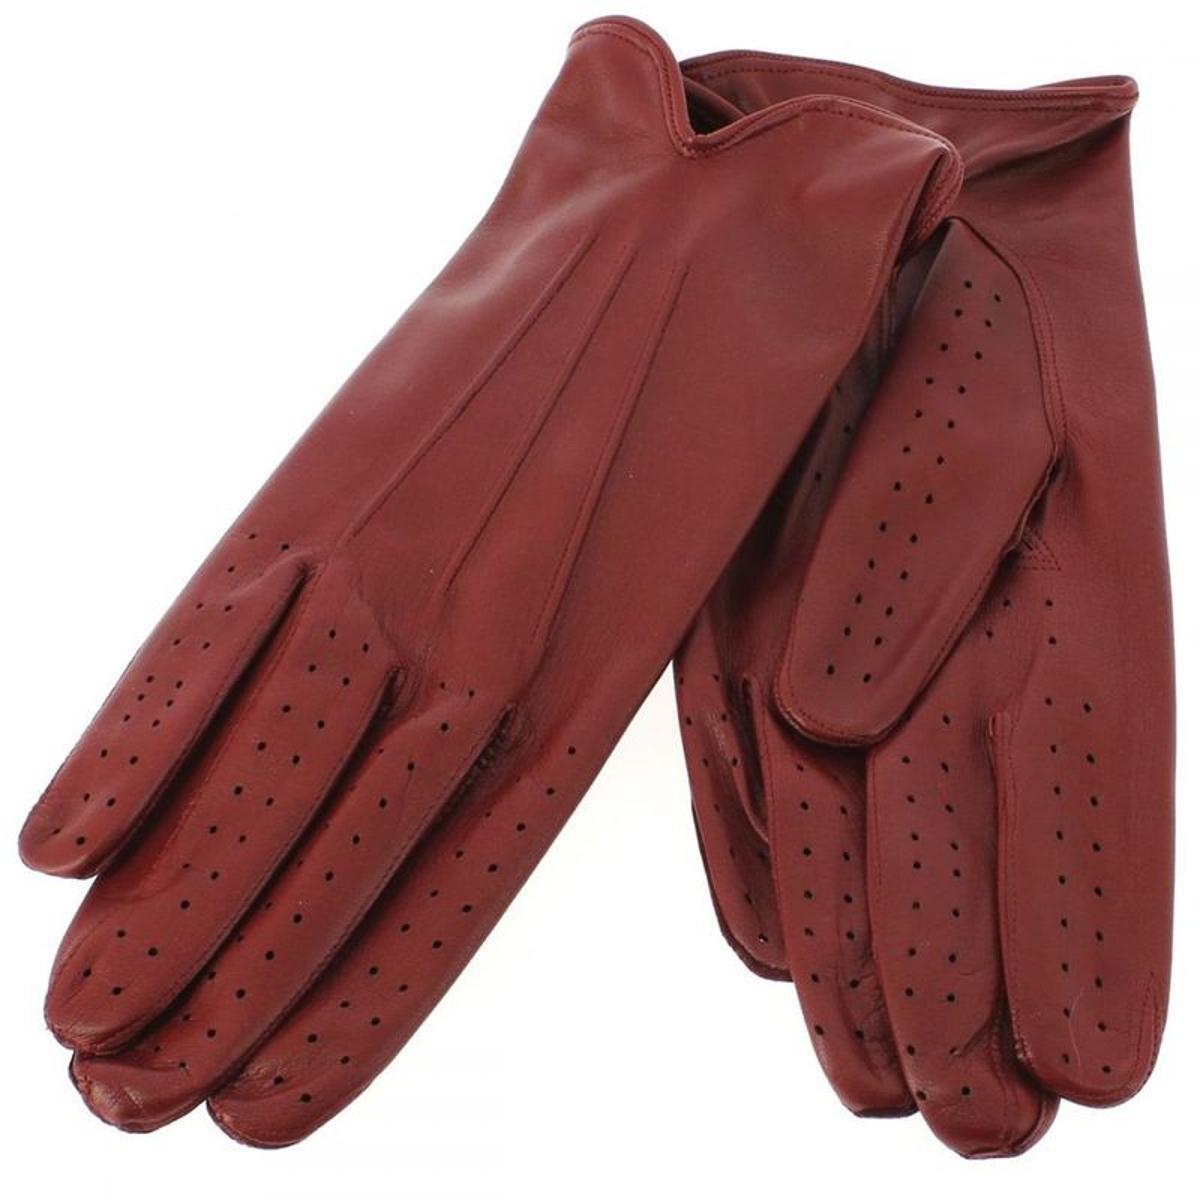 Gant cuir rouge Luxe, agneau, fait main en Italie